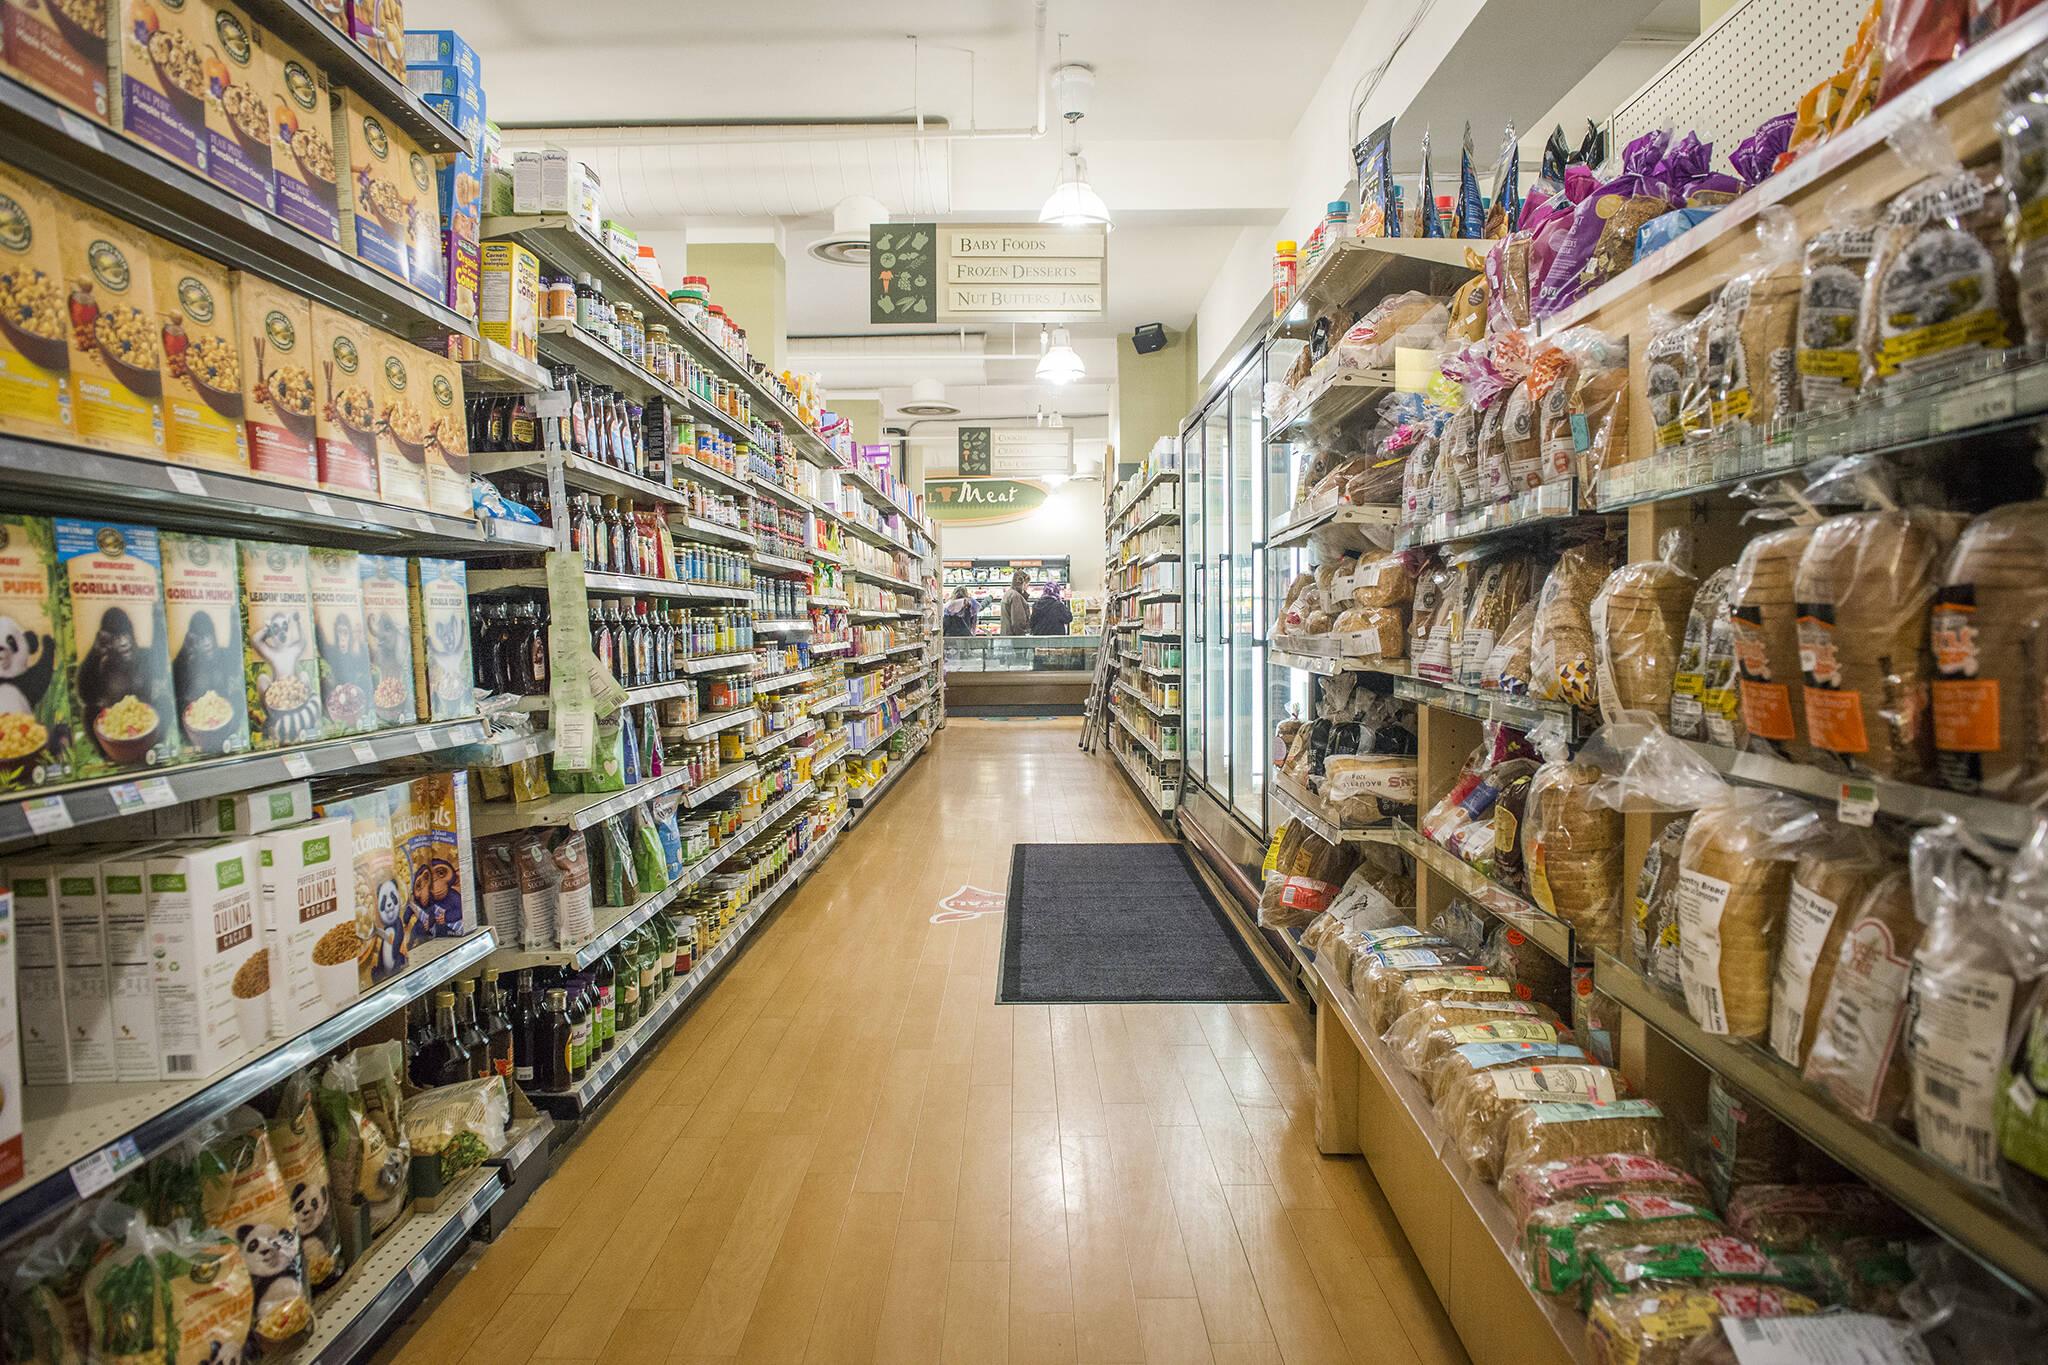 Kensington Market Health Food Stores